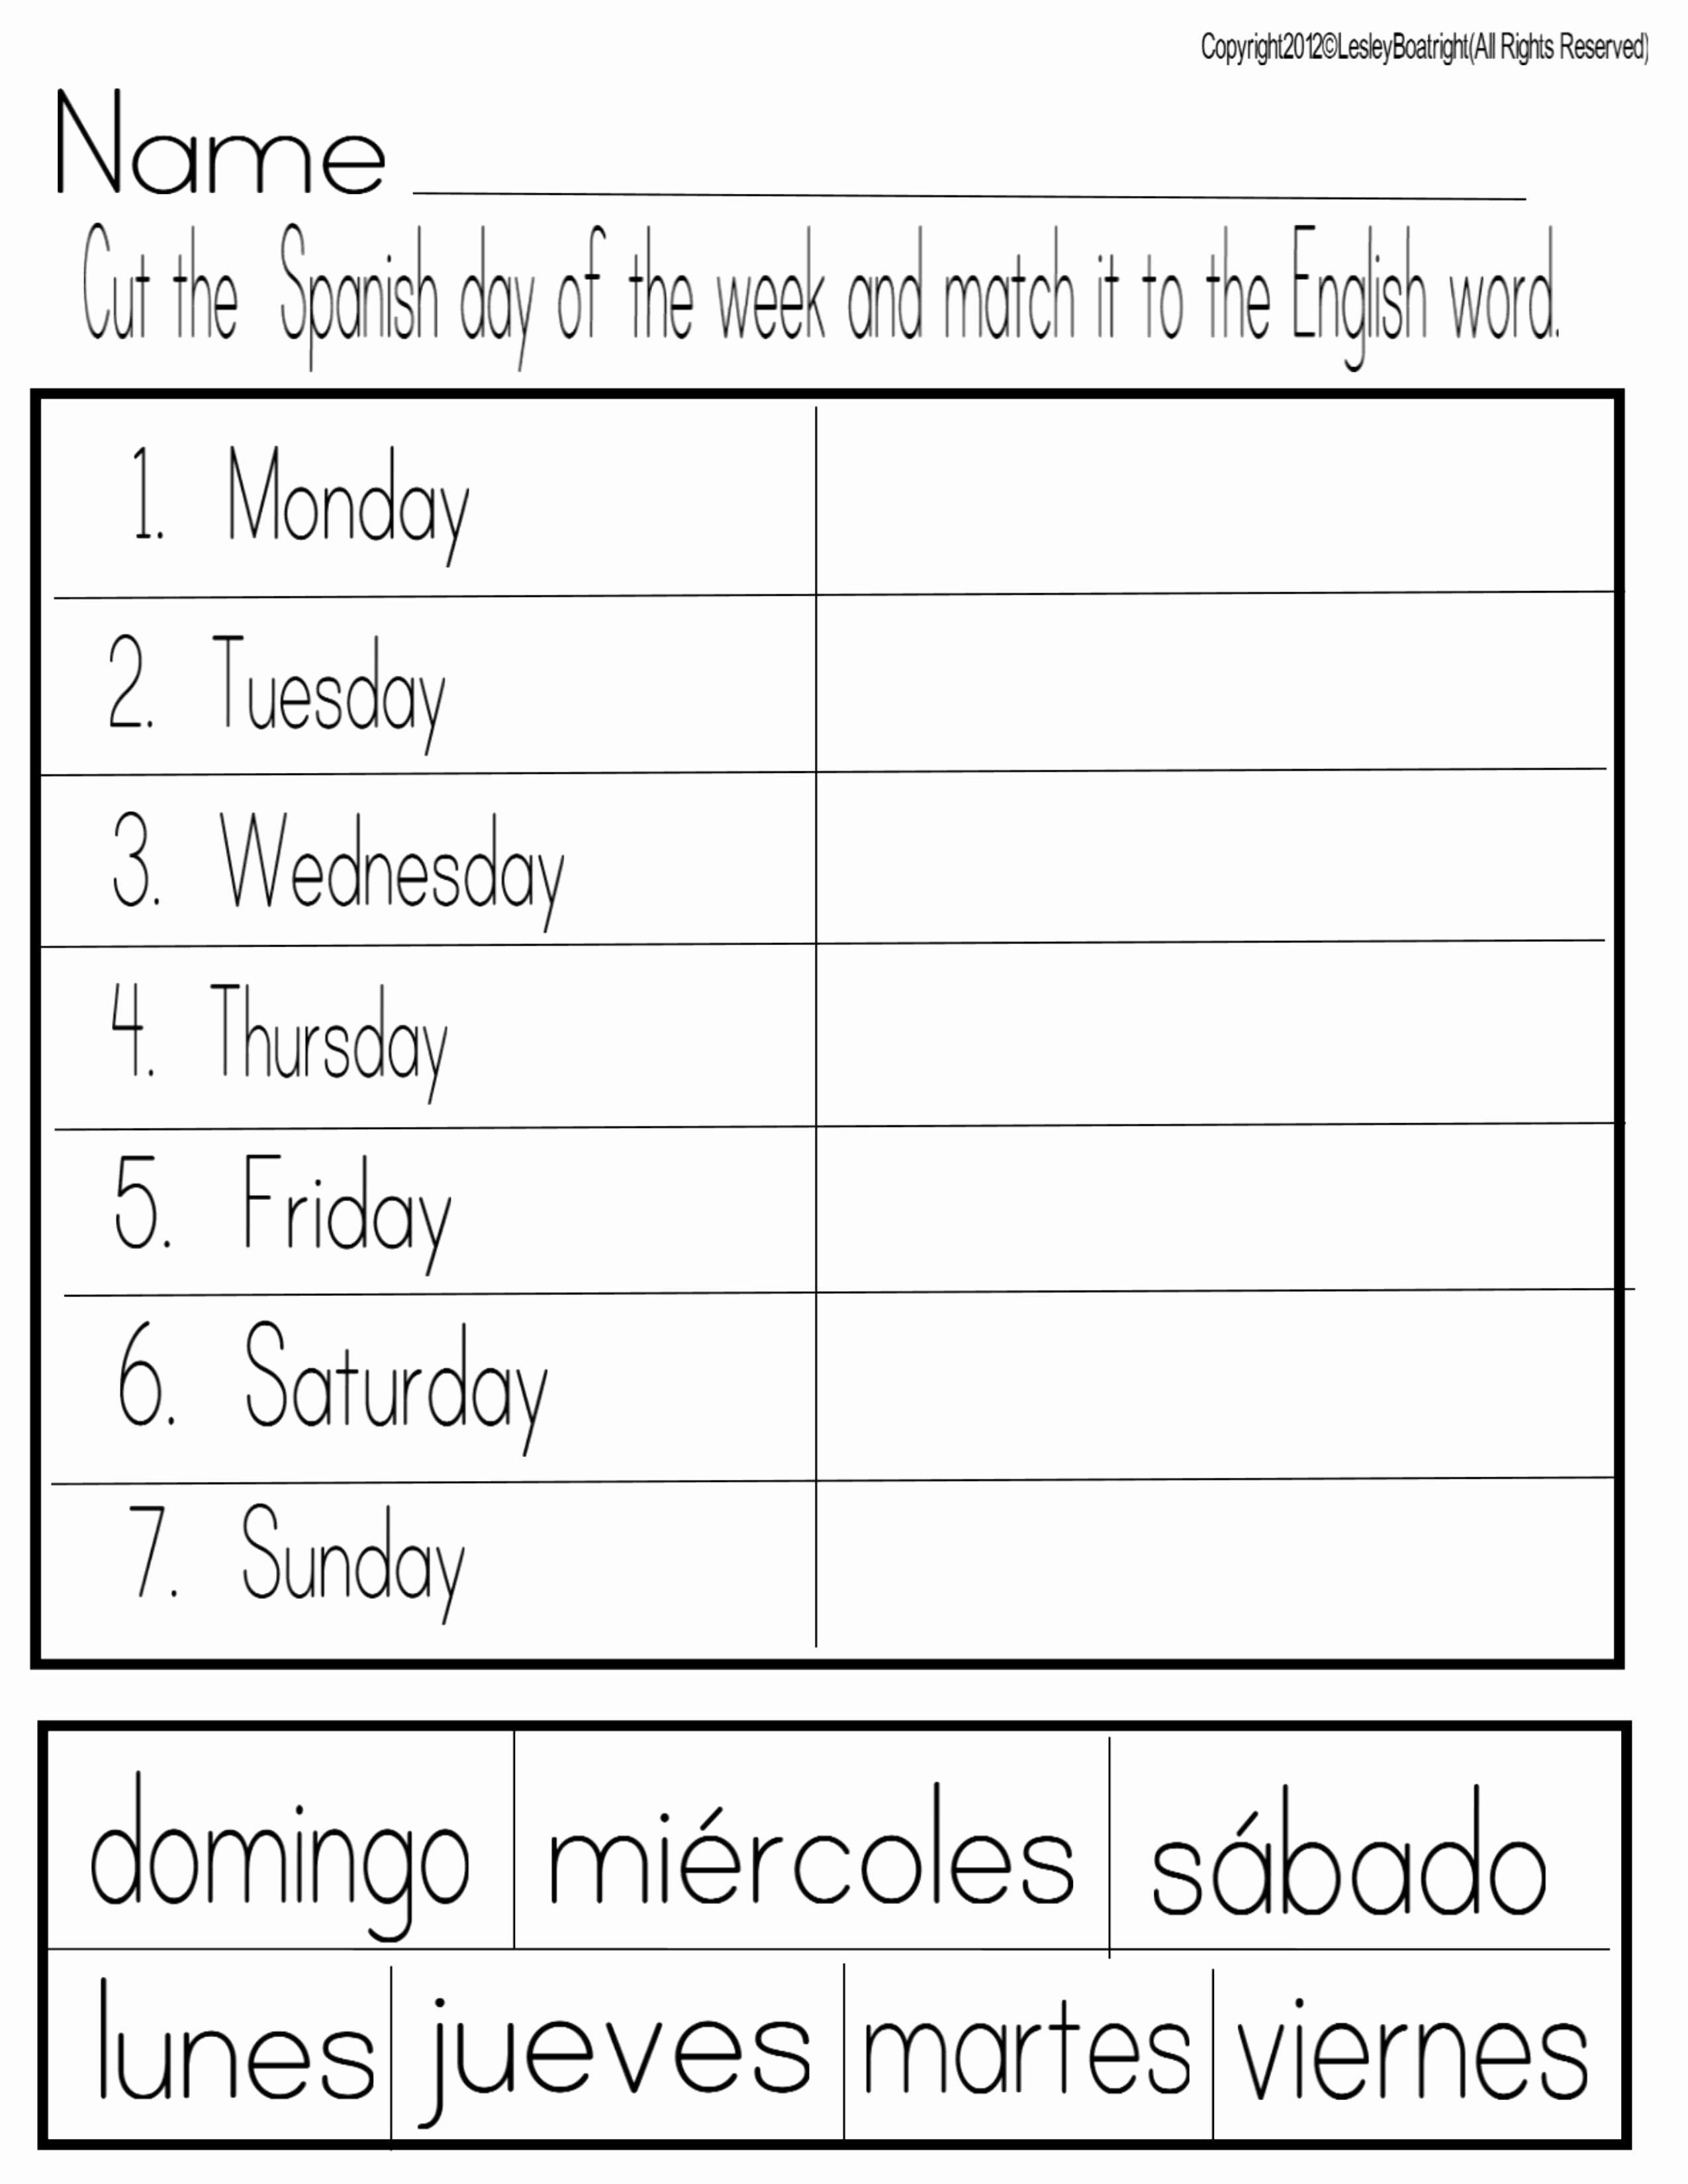 Star Of The Week Printables Inspirational 18 Best Of Student The Week Preschool Workshee Kindergarten Worksheets Learn Spanish Online Learning Spanish For Kids [ 3300 x 2550 Pixel ]